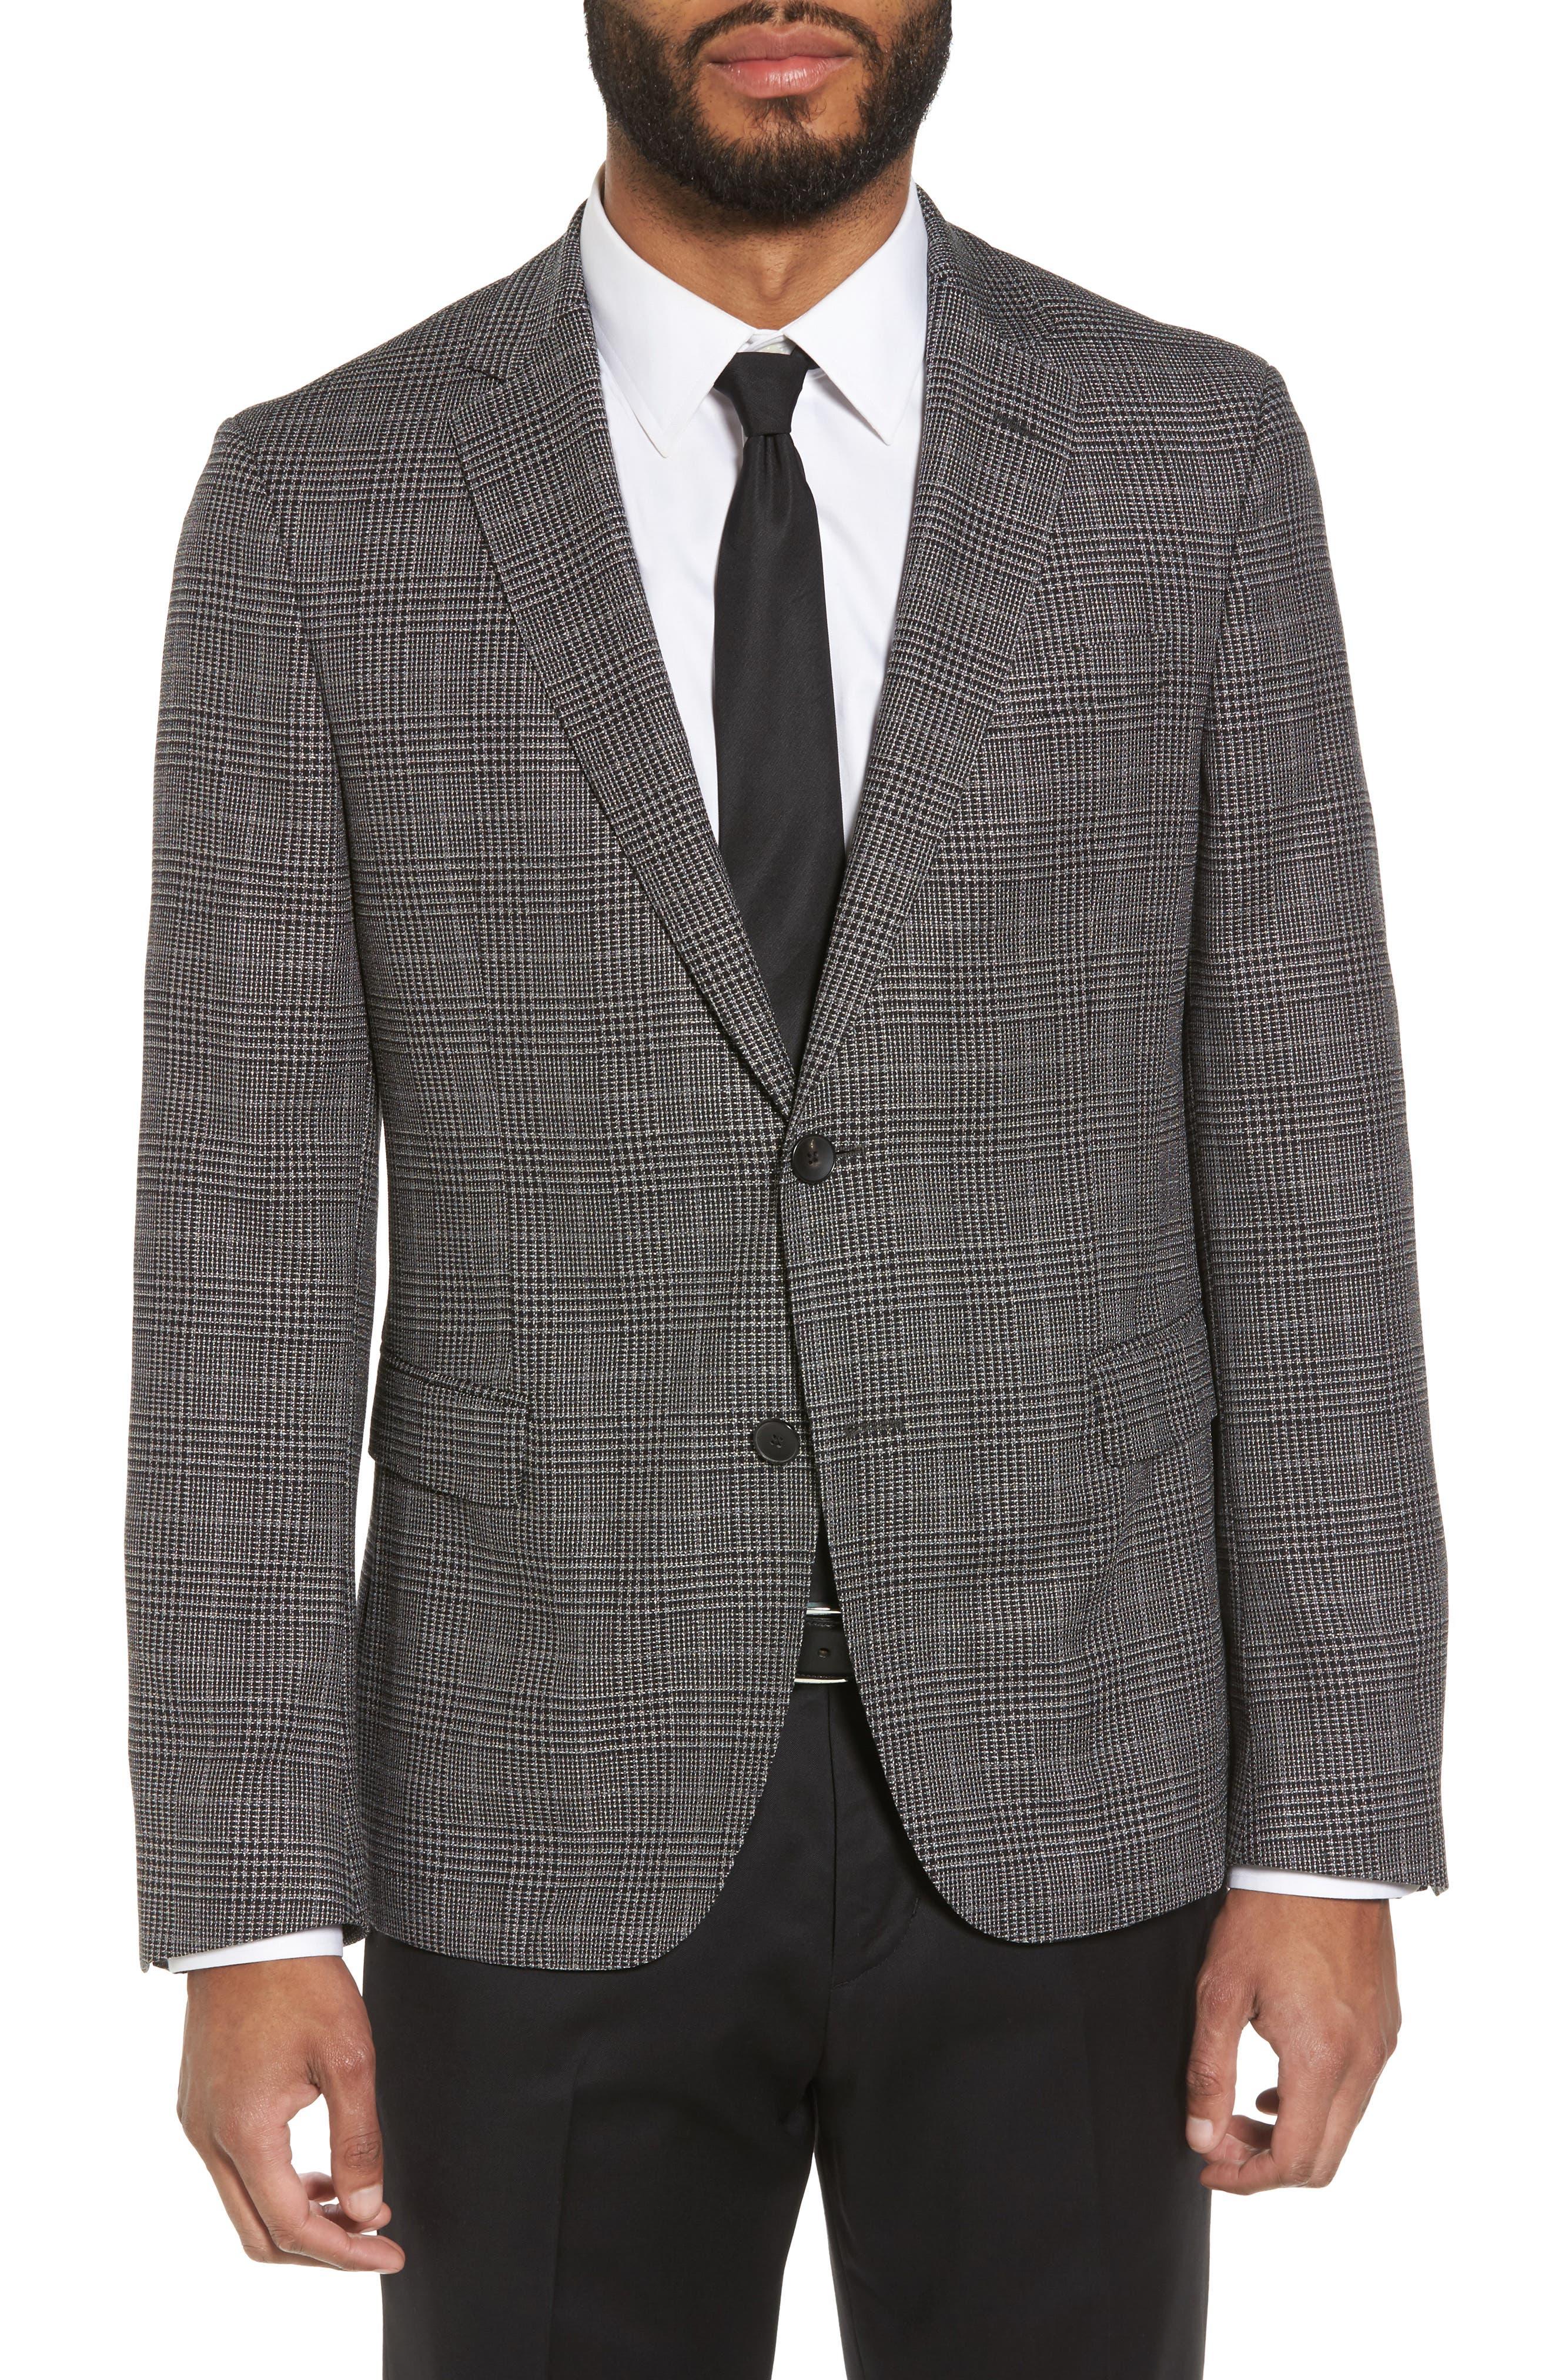 Main Image - BOSS Nobis Trim Fit Plaid Wool & Silk Blend Sport Coat